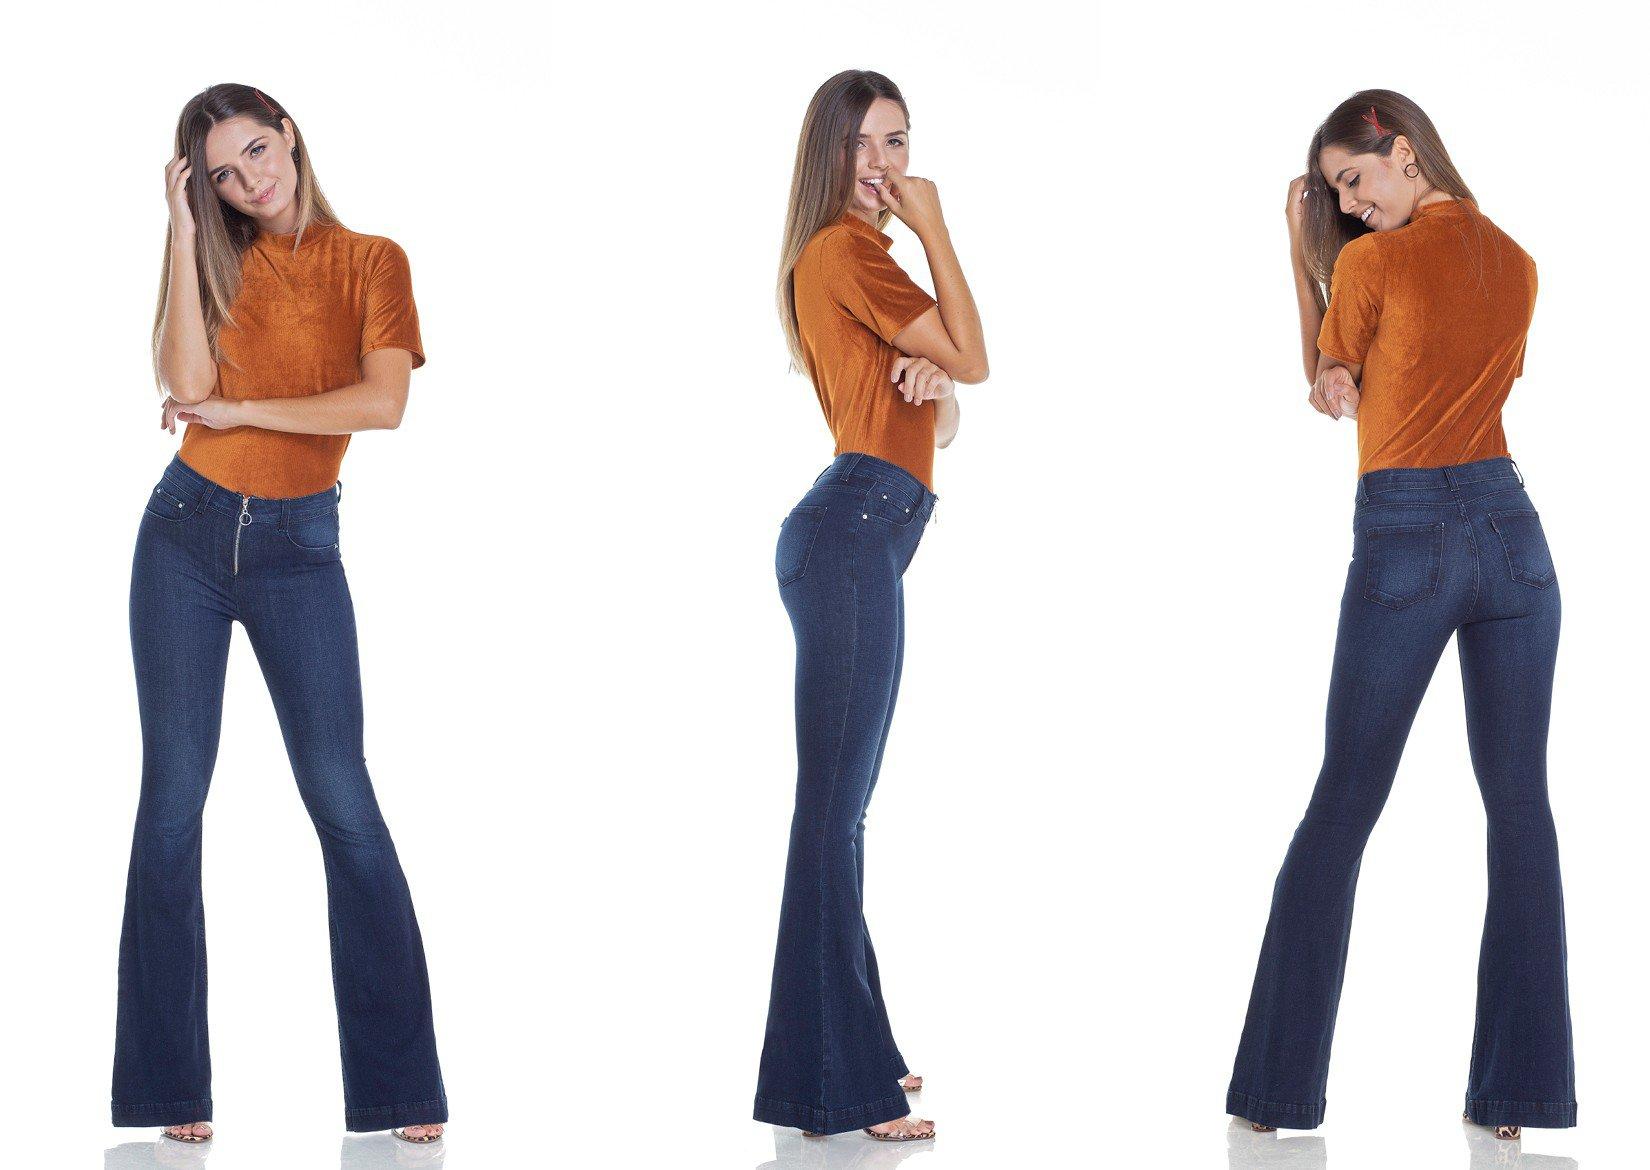 dz2950 calca jeans flare media escura com fechamento de ziper tripla denim zero